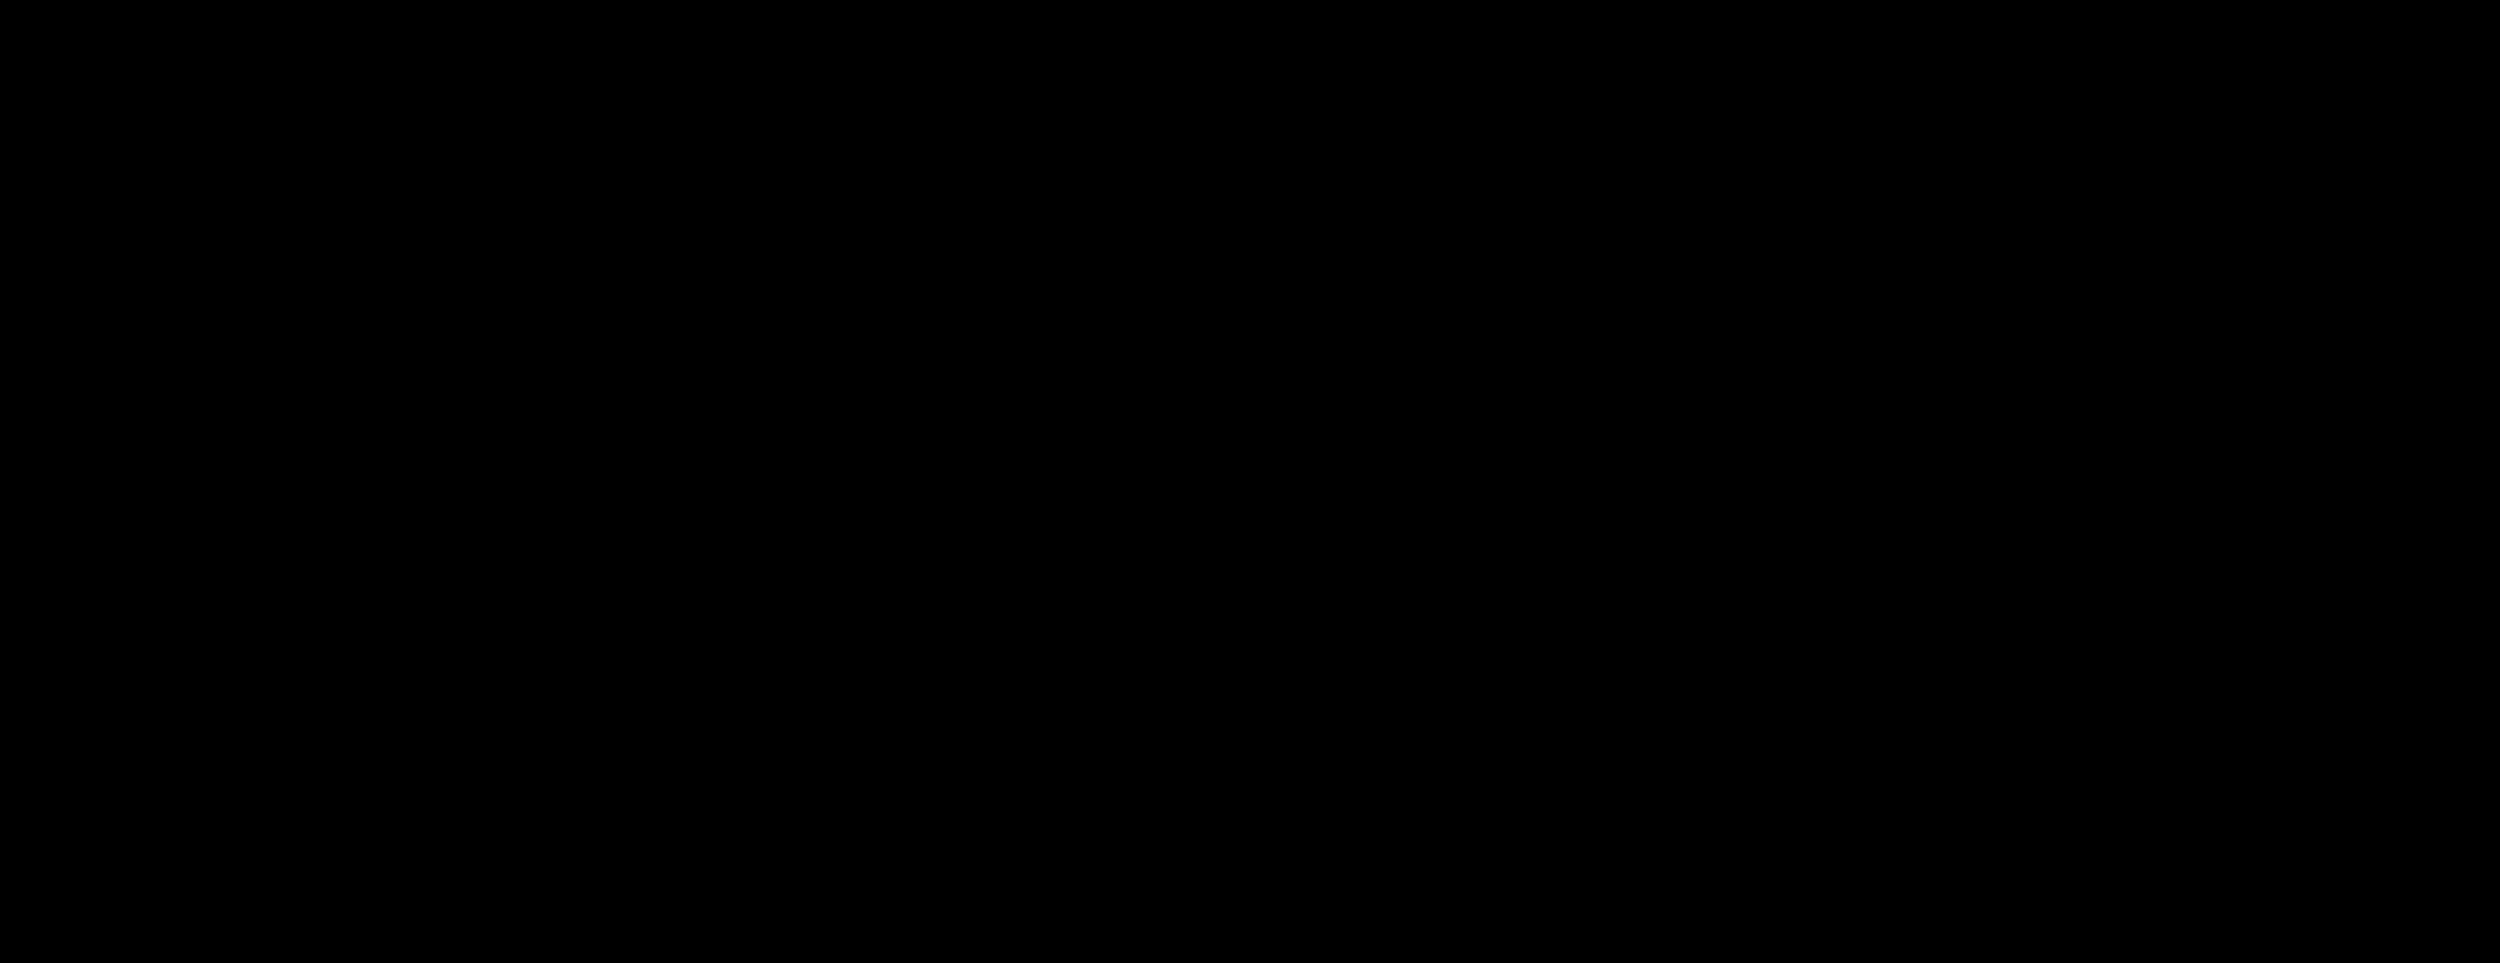 PROFESSIONAL-logo-black.png